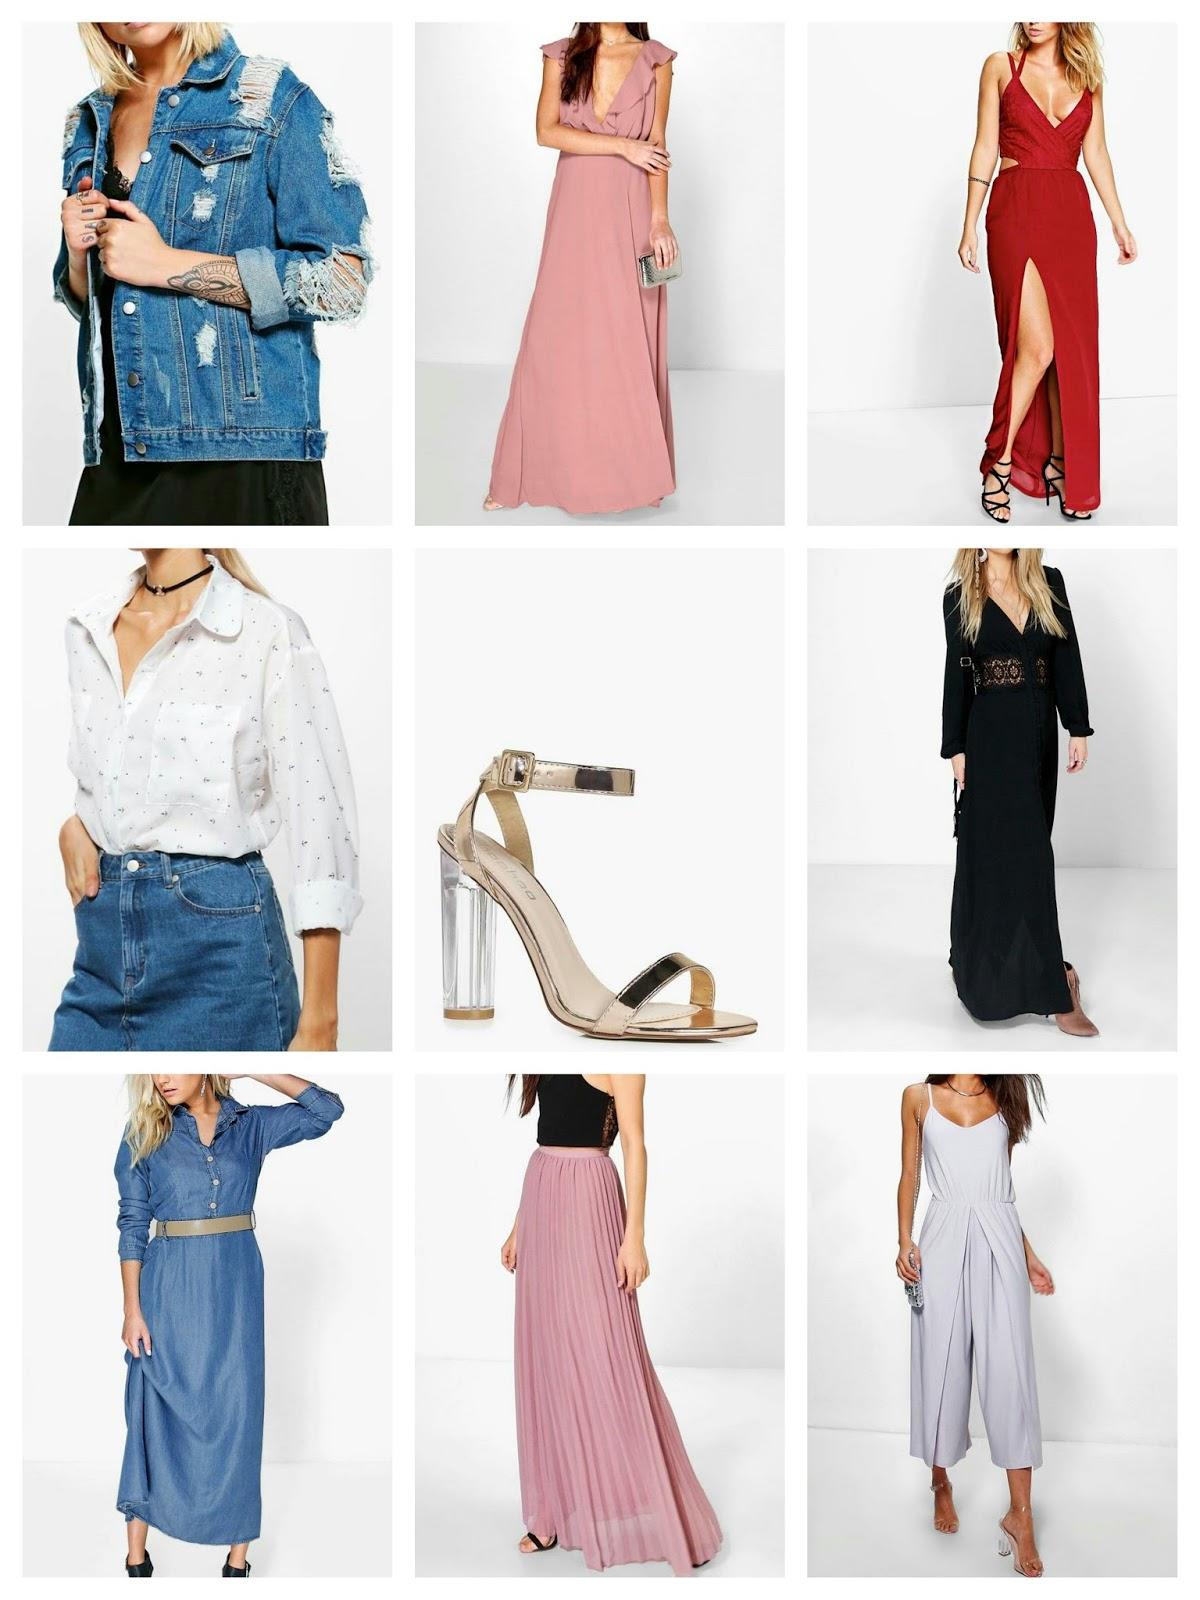 Louisiana shopping online